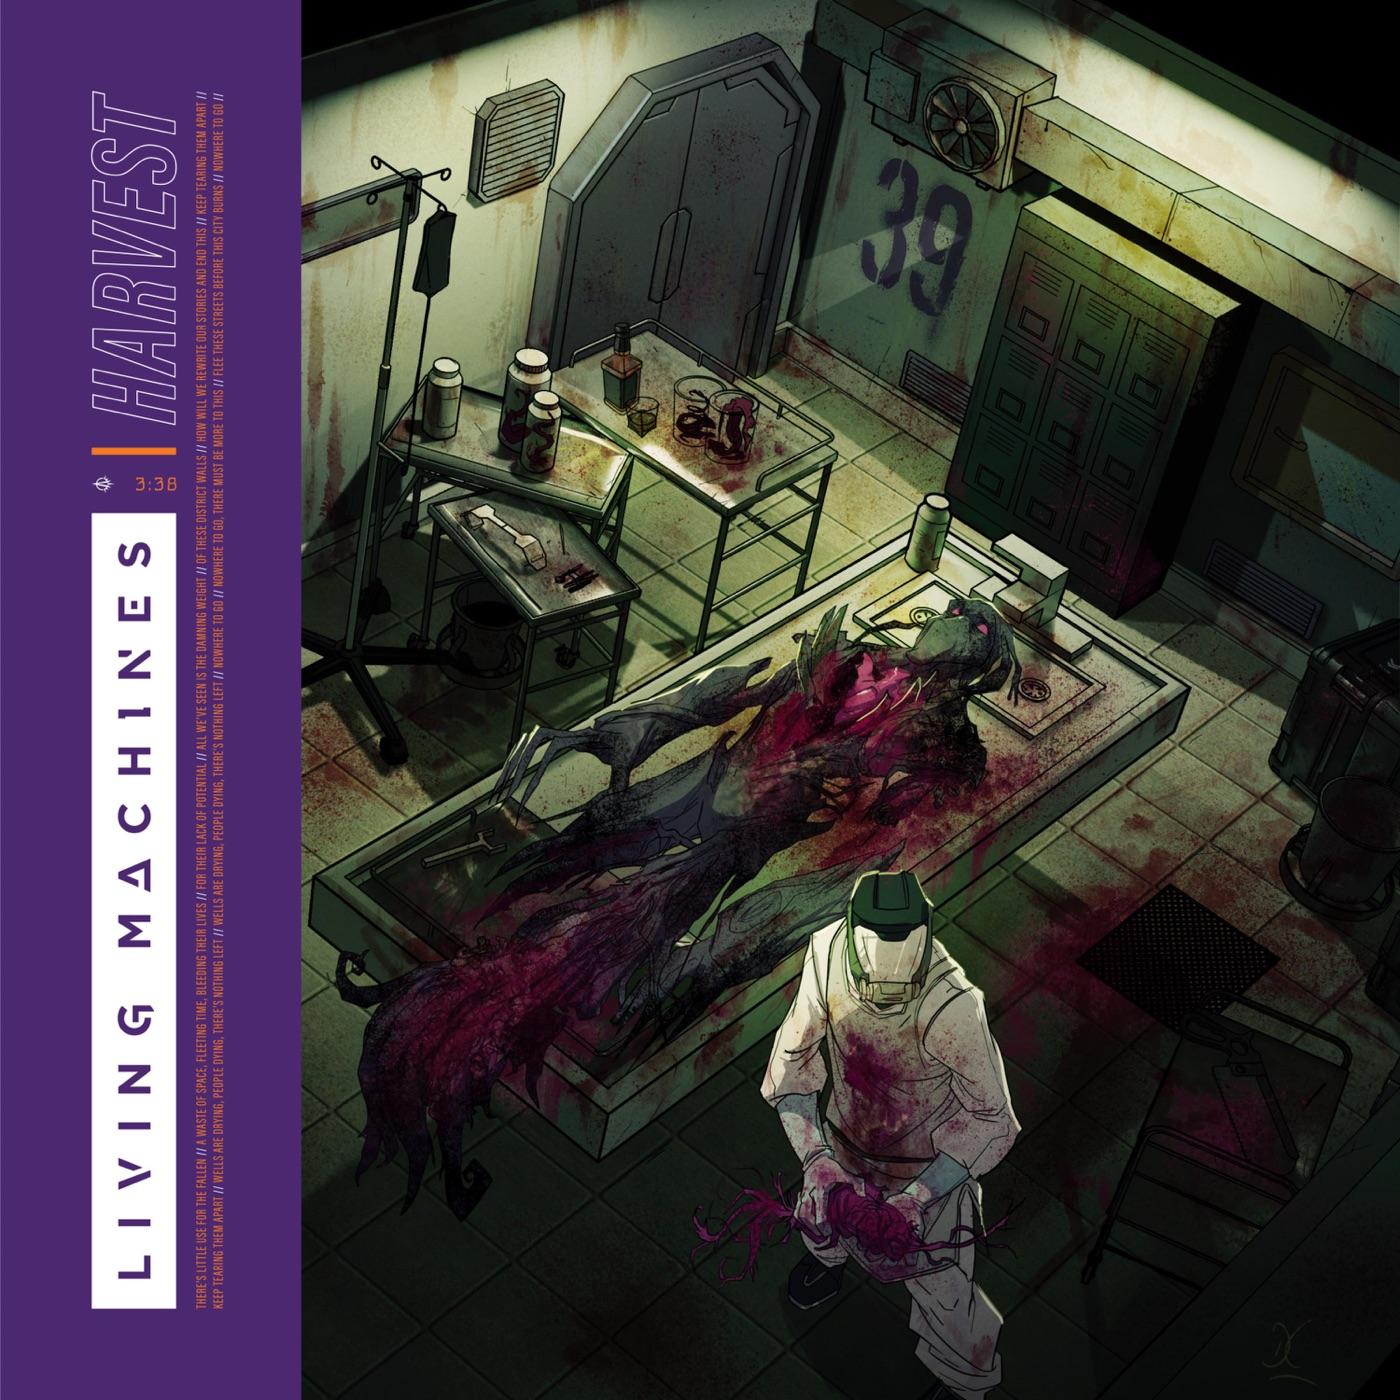 Living Machines - Harvest [single] (2019)